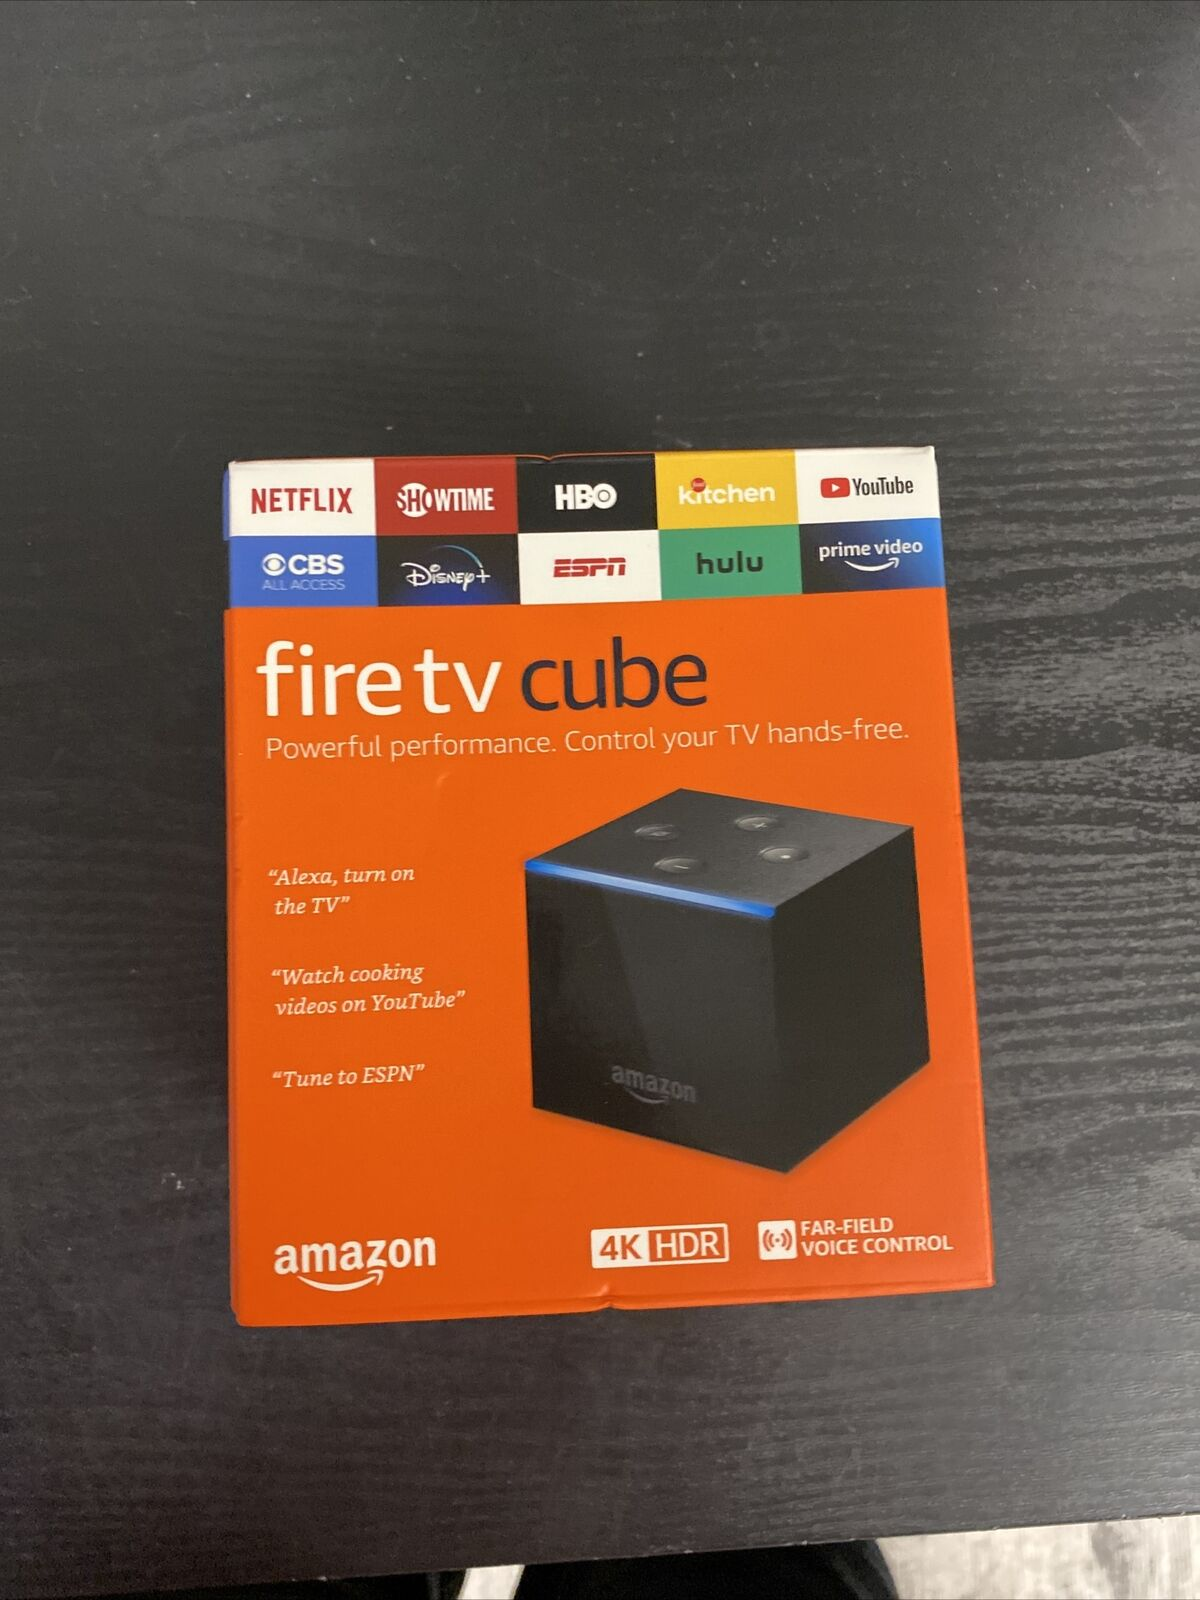 NEW Amazon Fire TV Cube Hands-Free with Alexa and 4K HDR Streaming Media Player alexa amazon and cube fire hdr media new streaming with